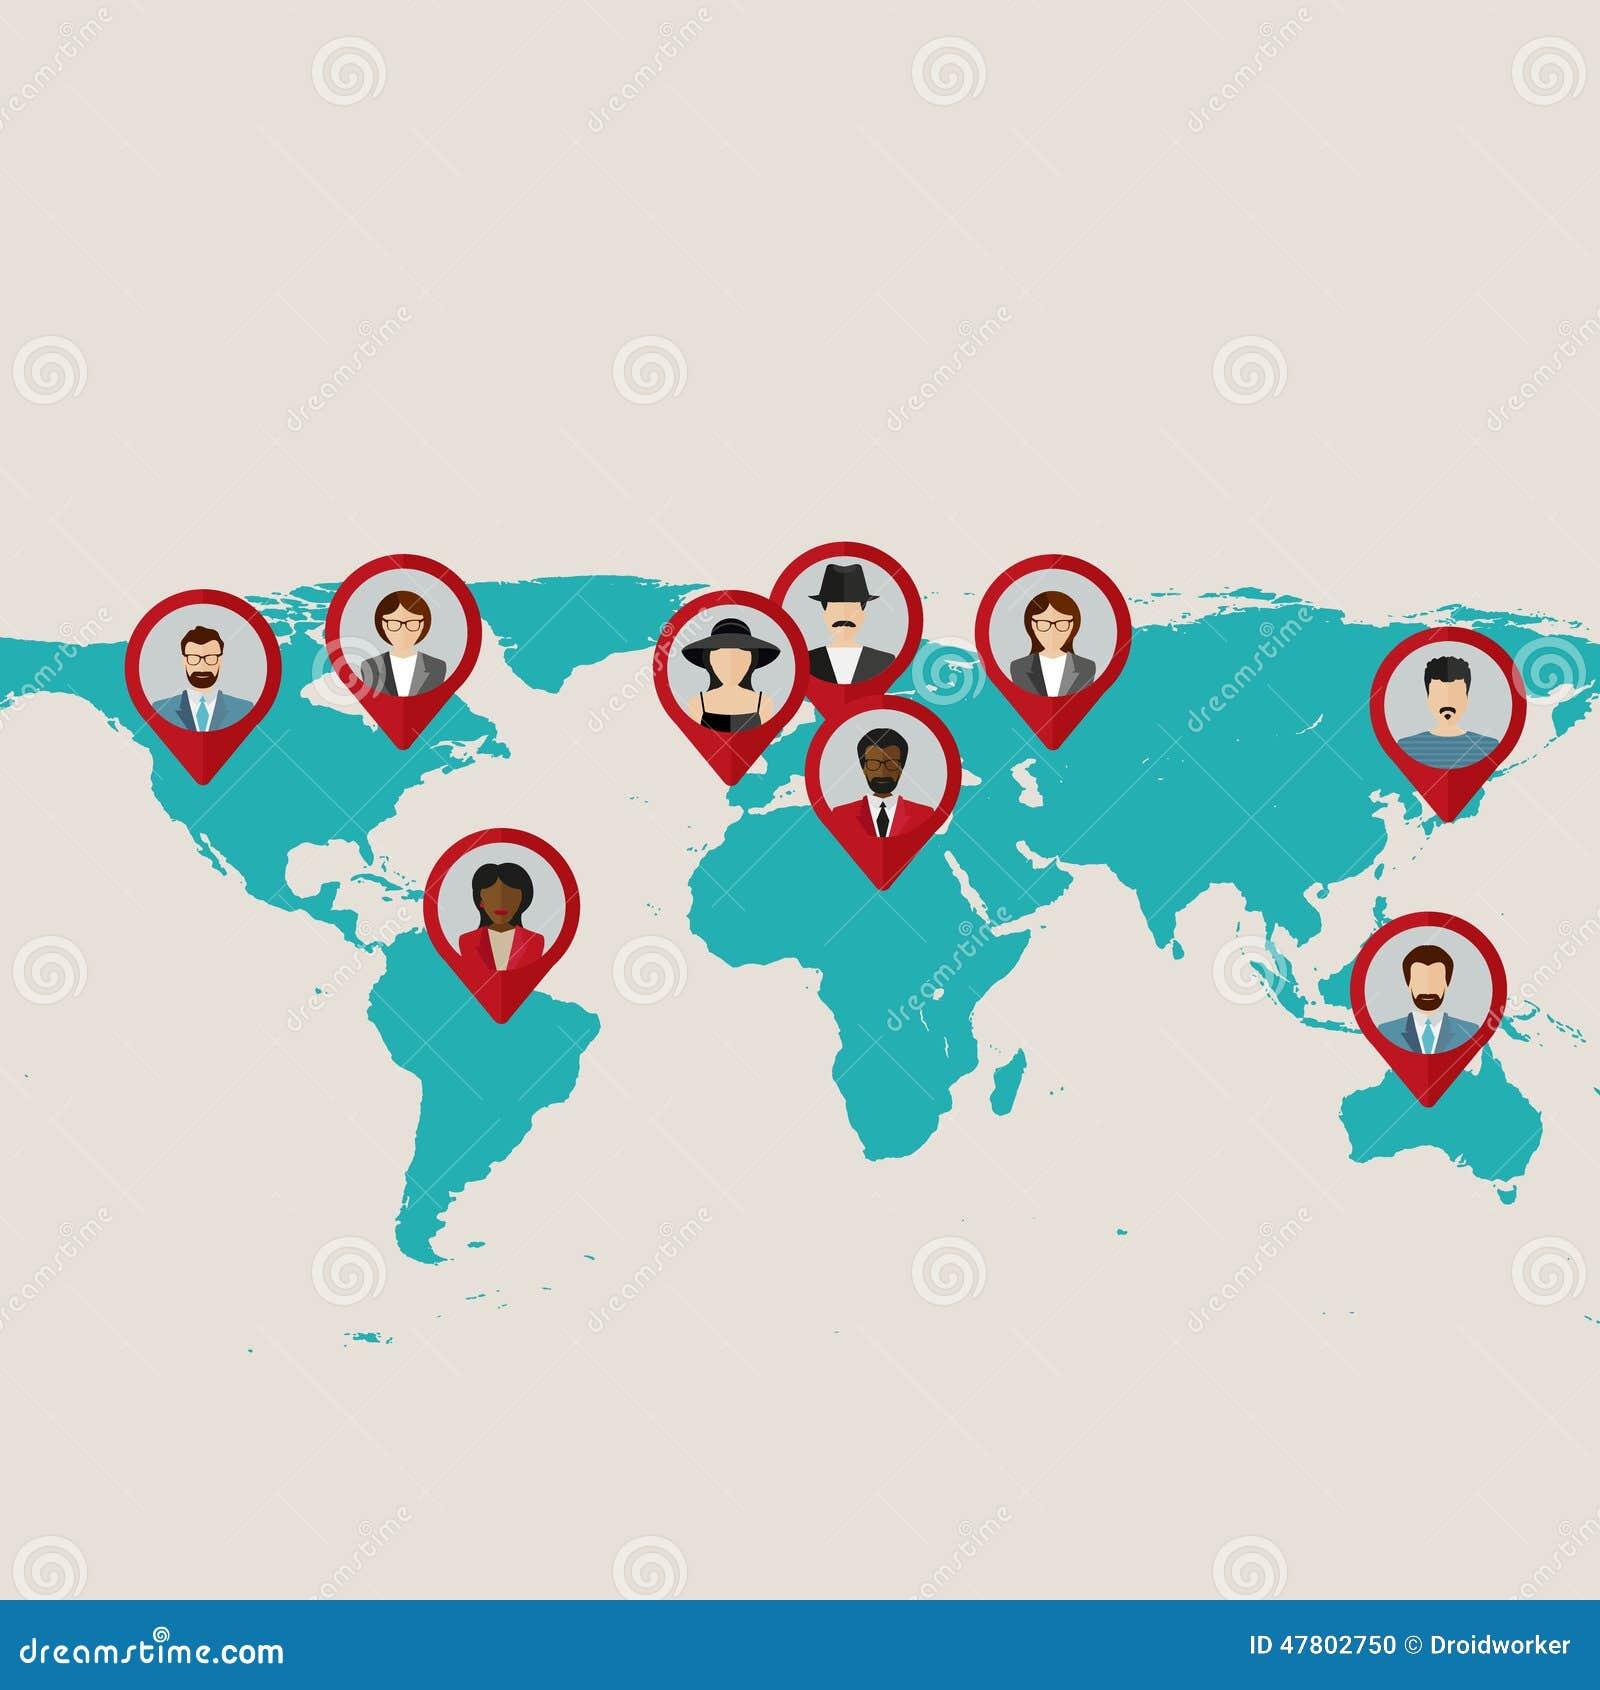 Website template designteamwork conceptflat world map with tags website template designteamwork conceptflat world map with tags points and destinations with flat faces avatar illustration 47802750 megapixl gumiabroncs Gallery